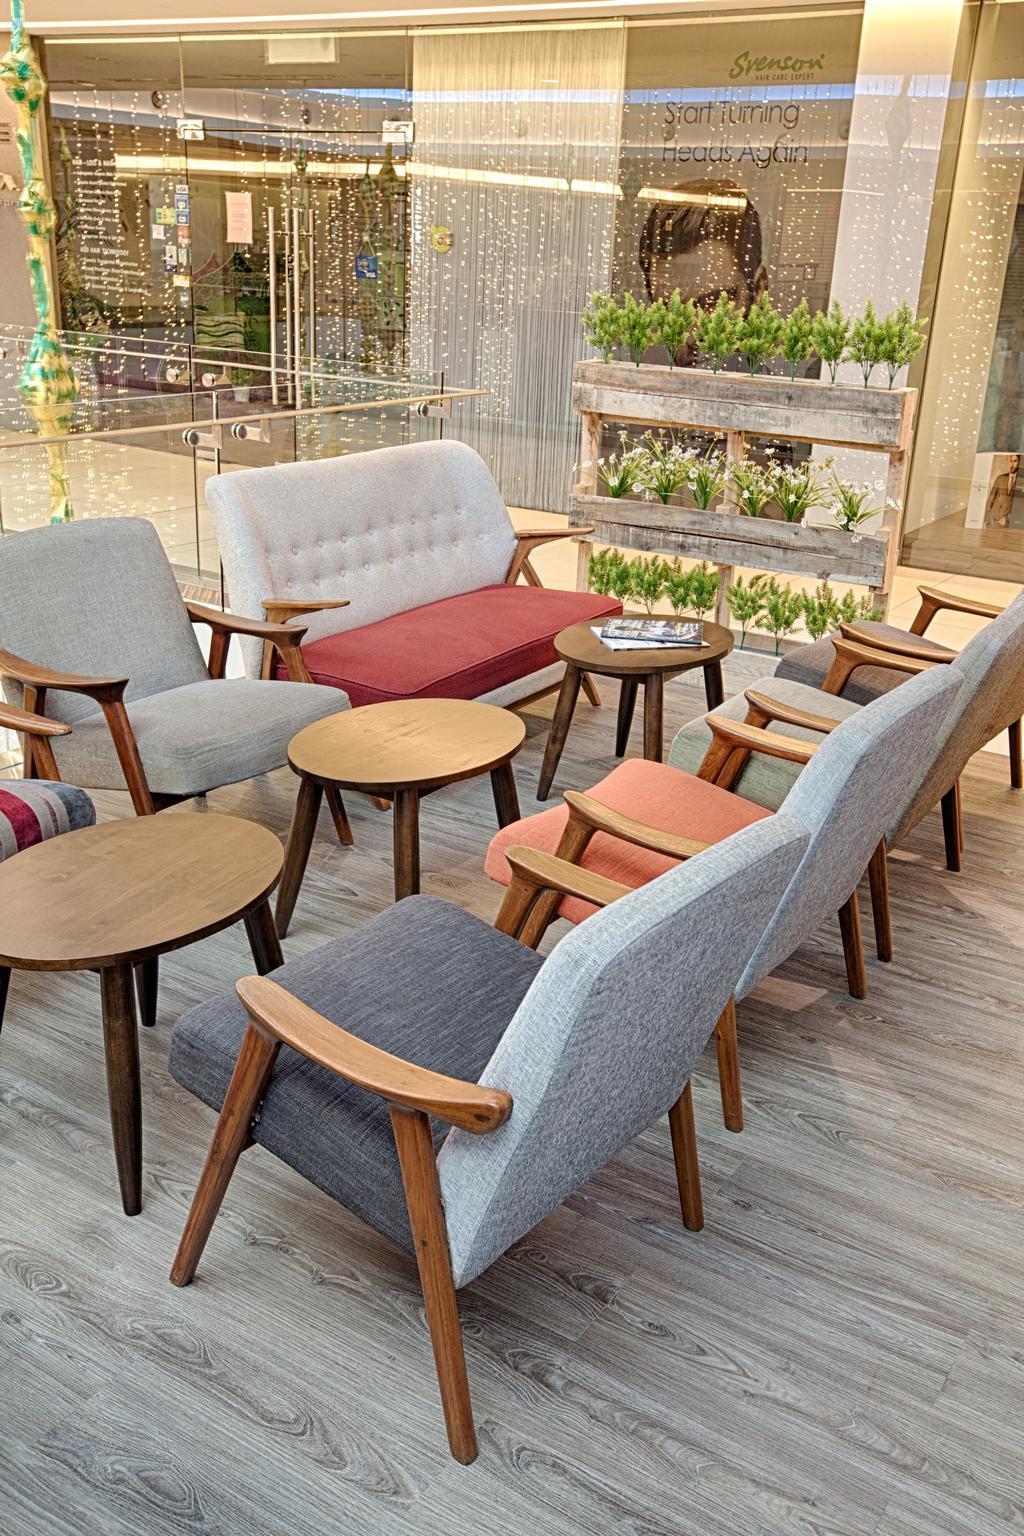 Sol 28, Jalan P Ramlee, Commercial, Interior Designer, GI Design Sdn Bhd, Scandinavian, Chair, Furniture, Dining Table, Table, Bench